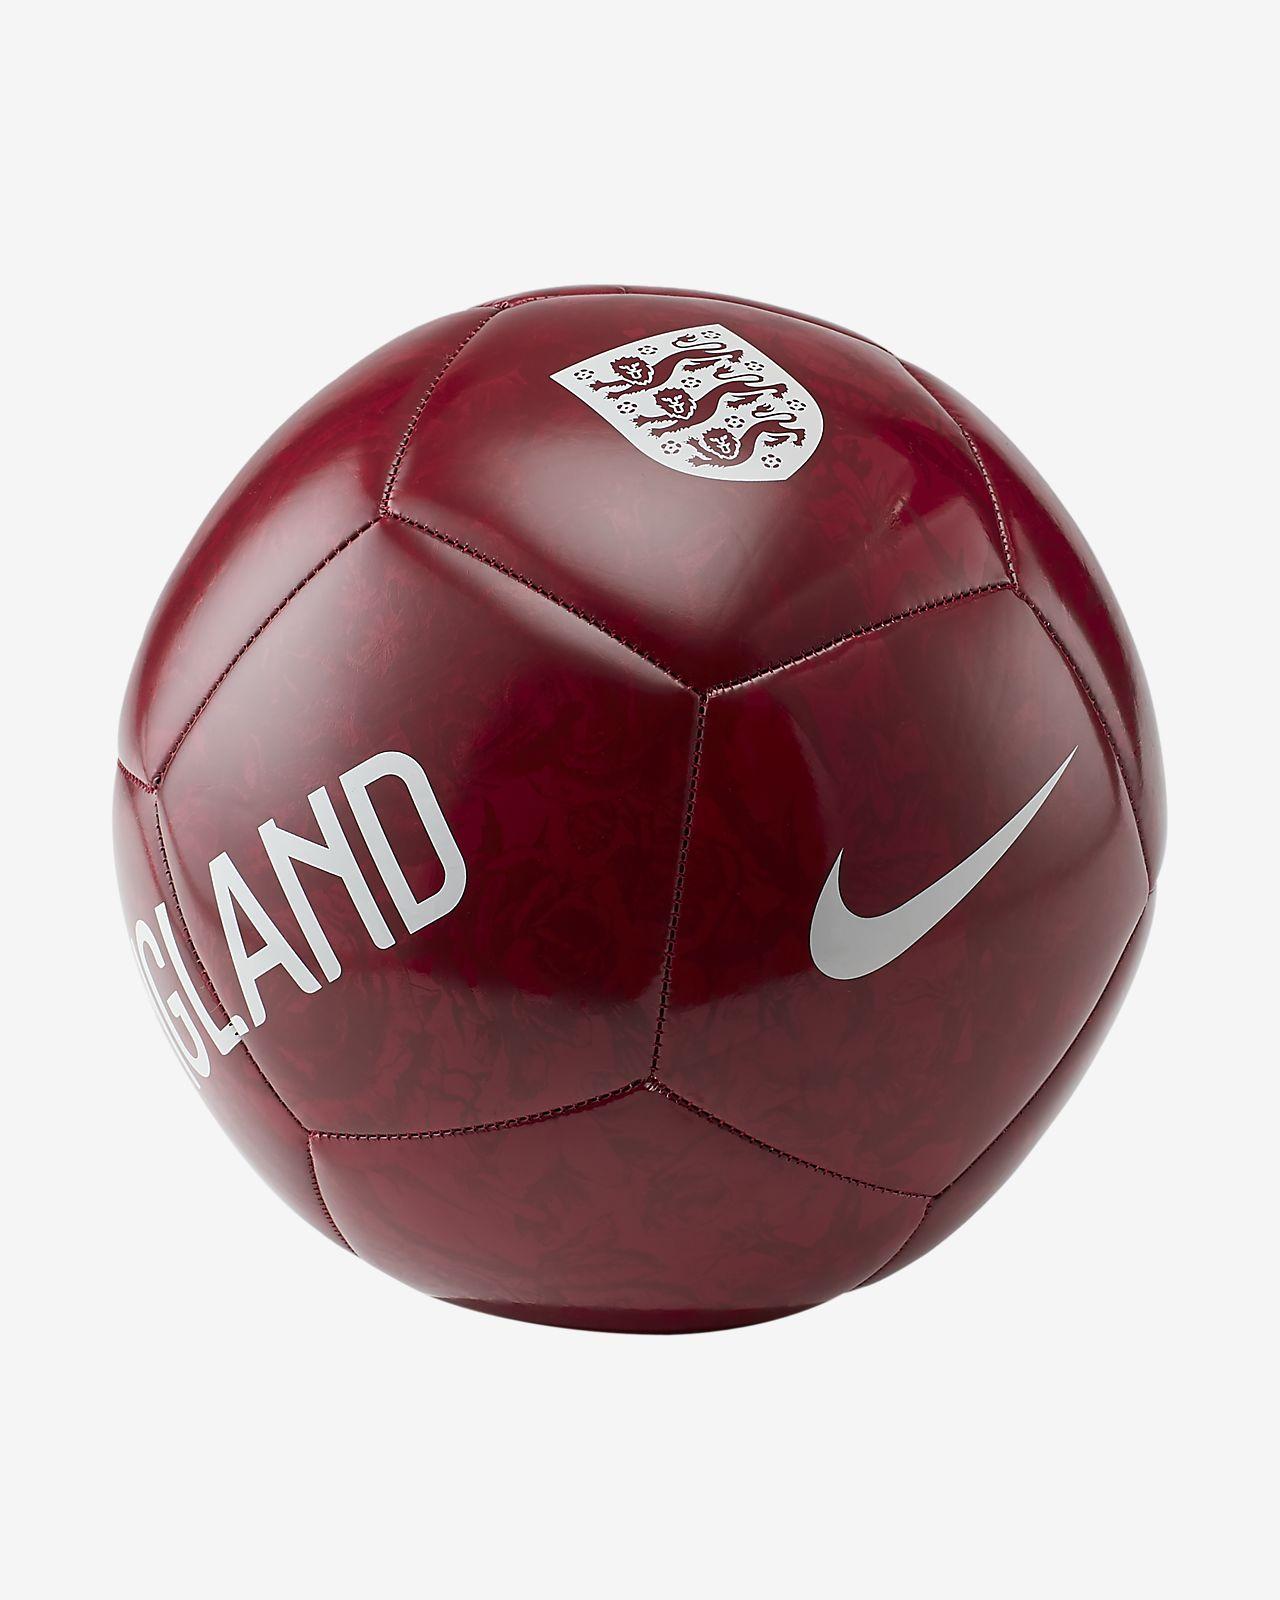 Pallone da calcio England Pitch